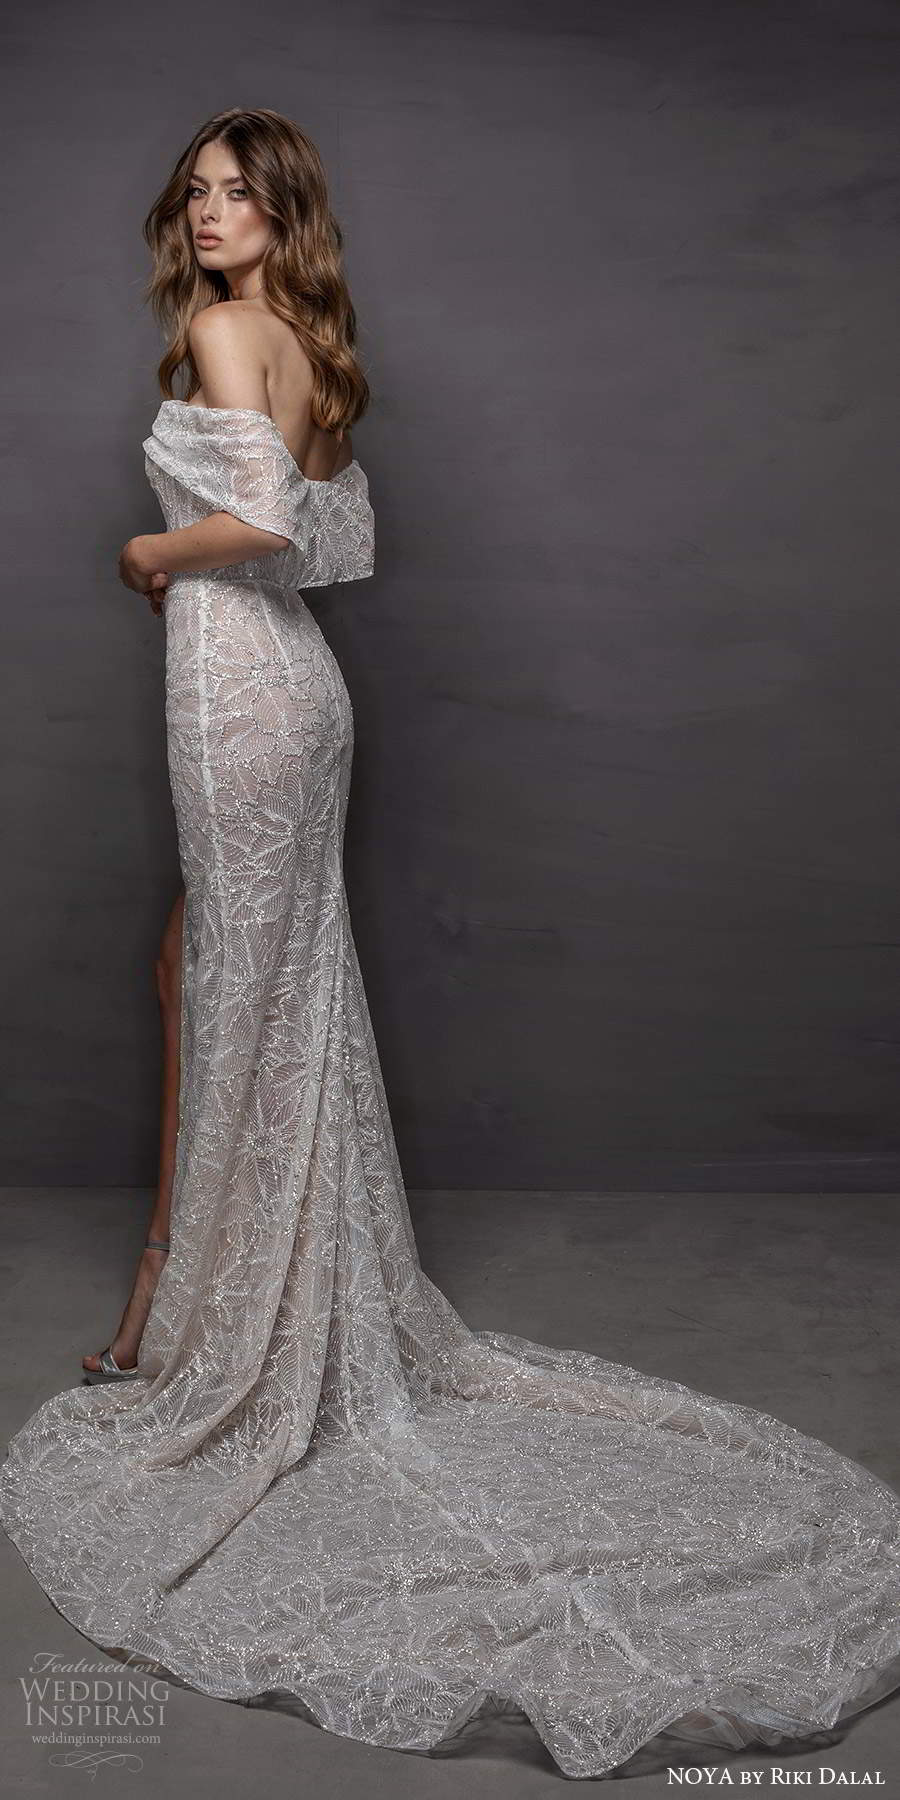 noya riki dalal 2021 bridal off shoulder sleeves asymmetric neckline fully embellished sheath wedding dress slit skirt (15) bv